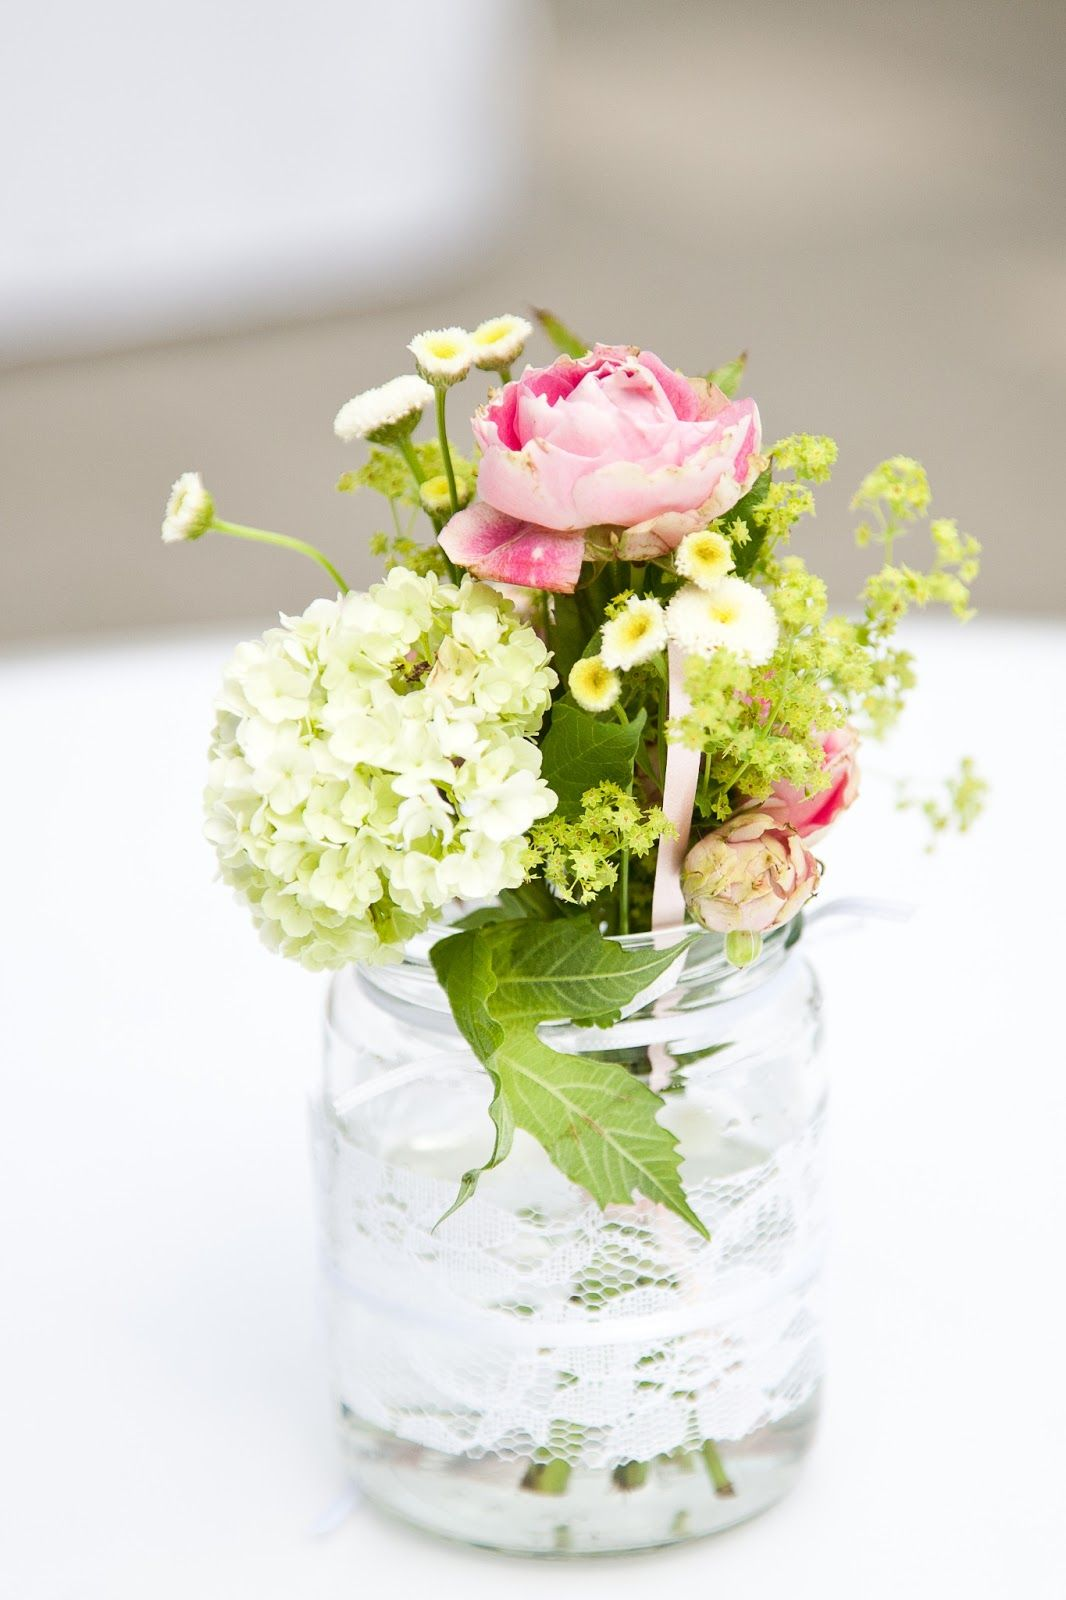 Blumen Tischdeko  Hochzeit Blumen  Tischdeko hochzeit